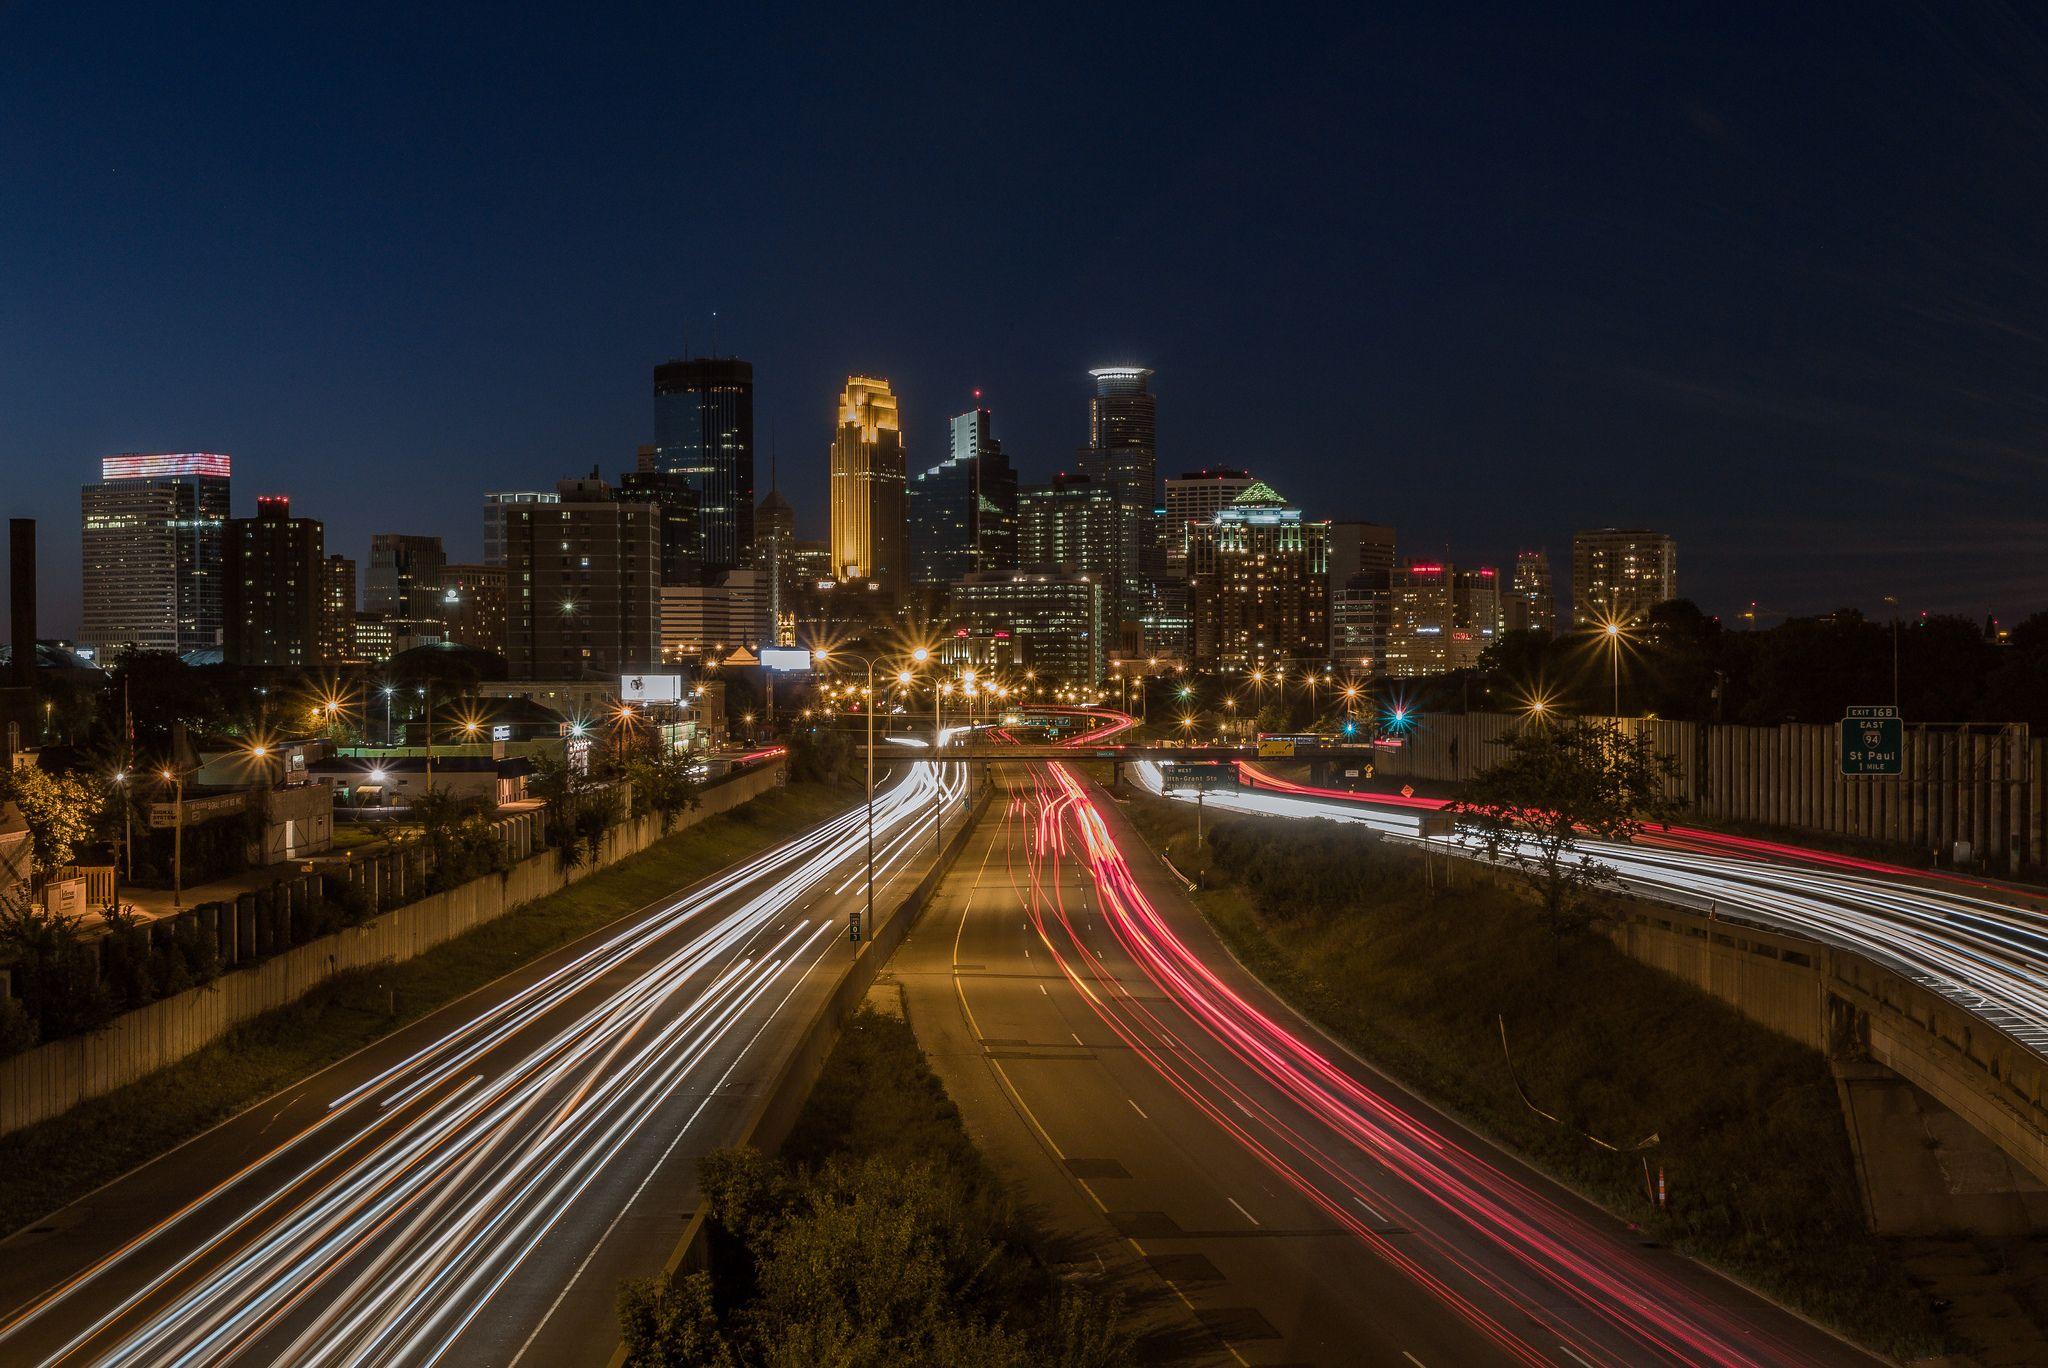 https://flic.kr/p/oUoxYg | Minneapolis Skyline just after Sunset.